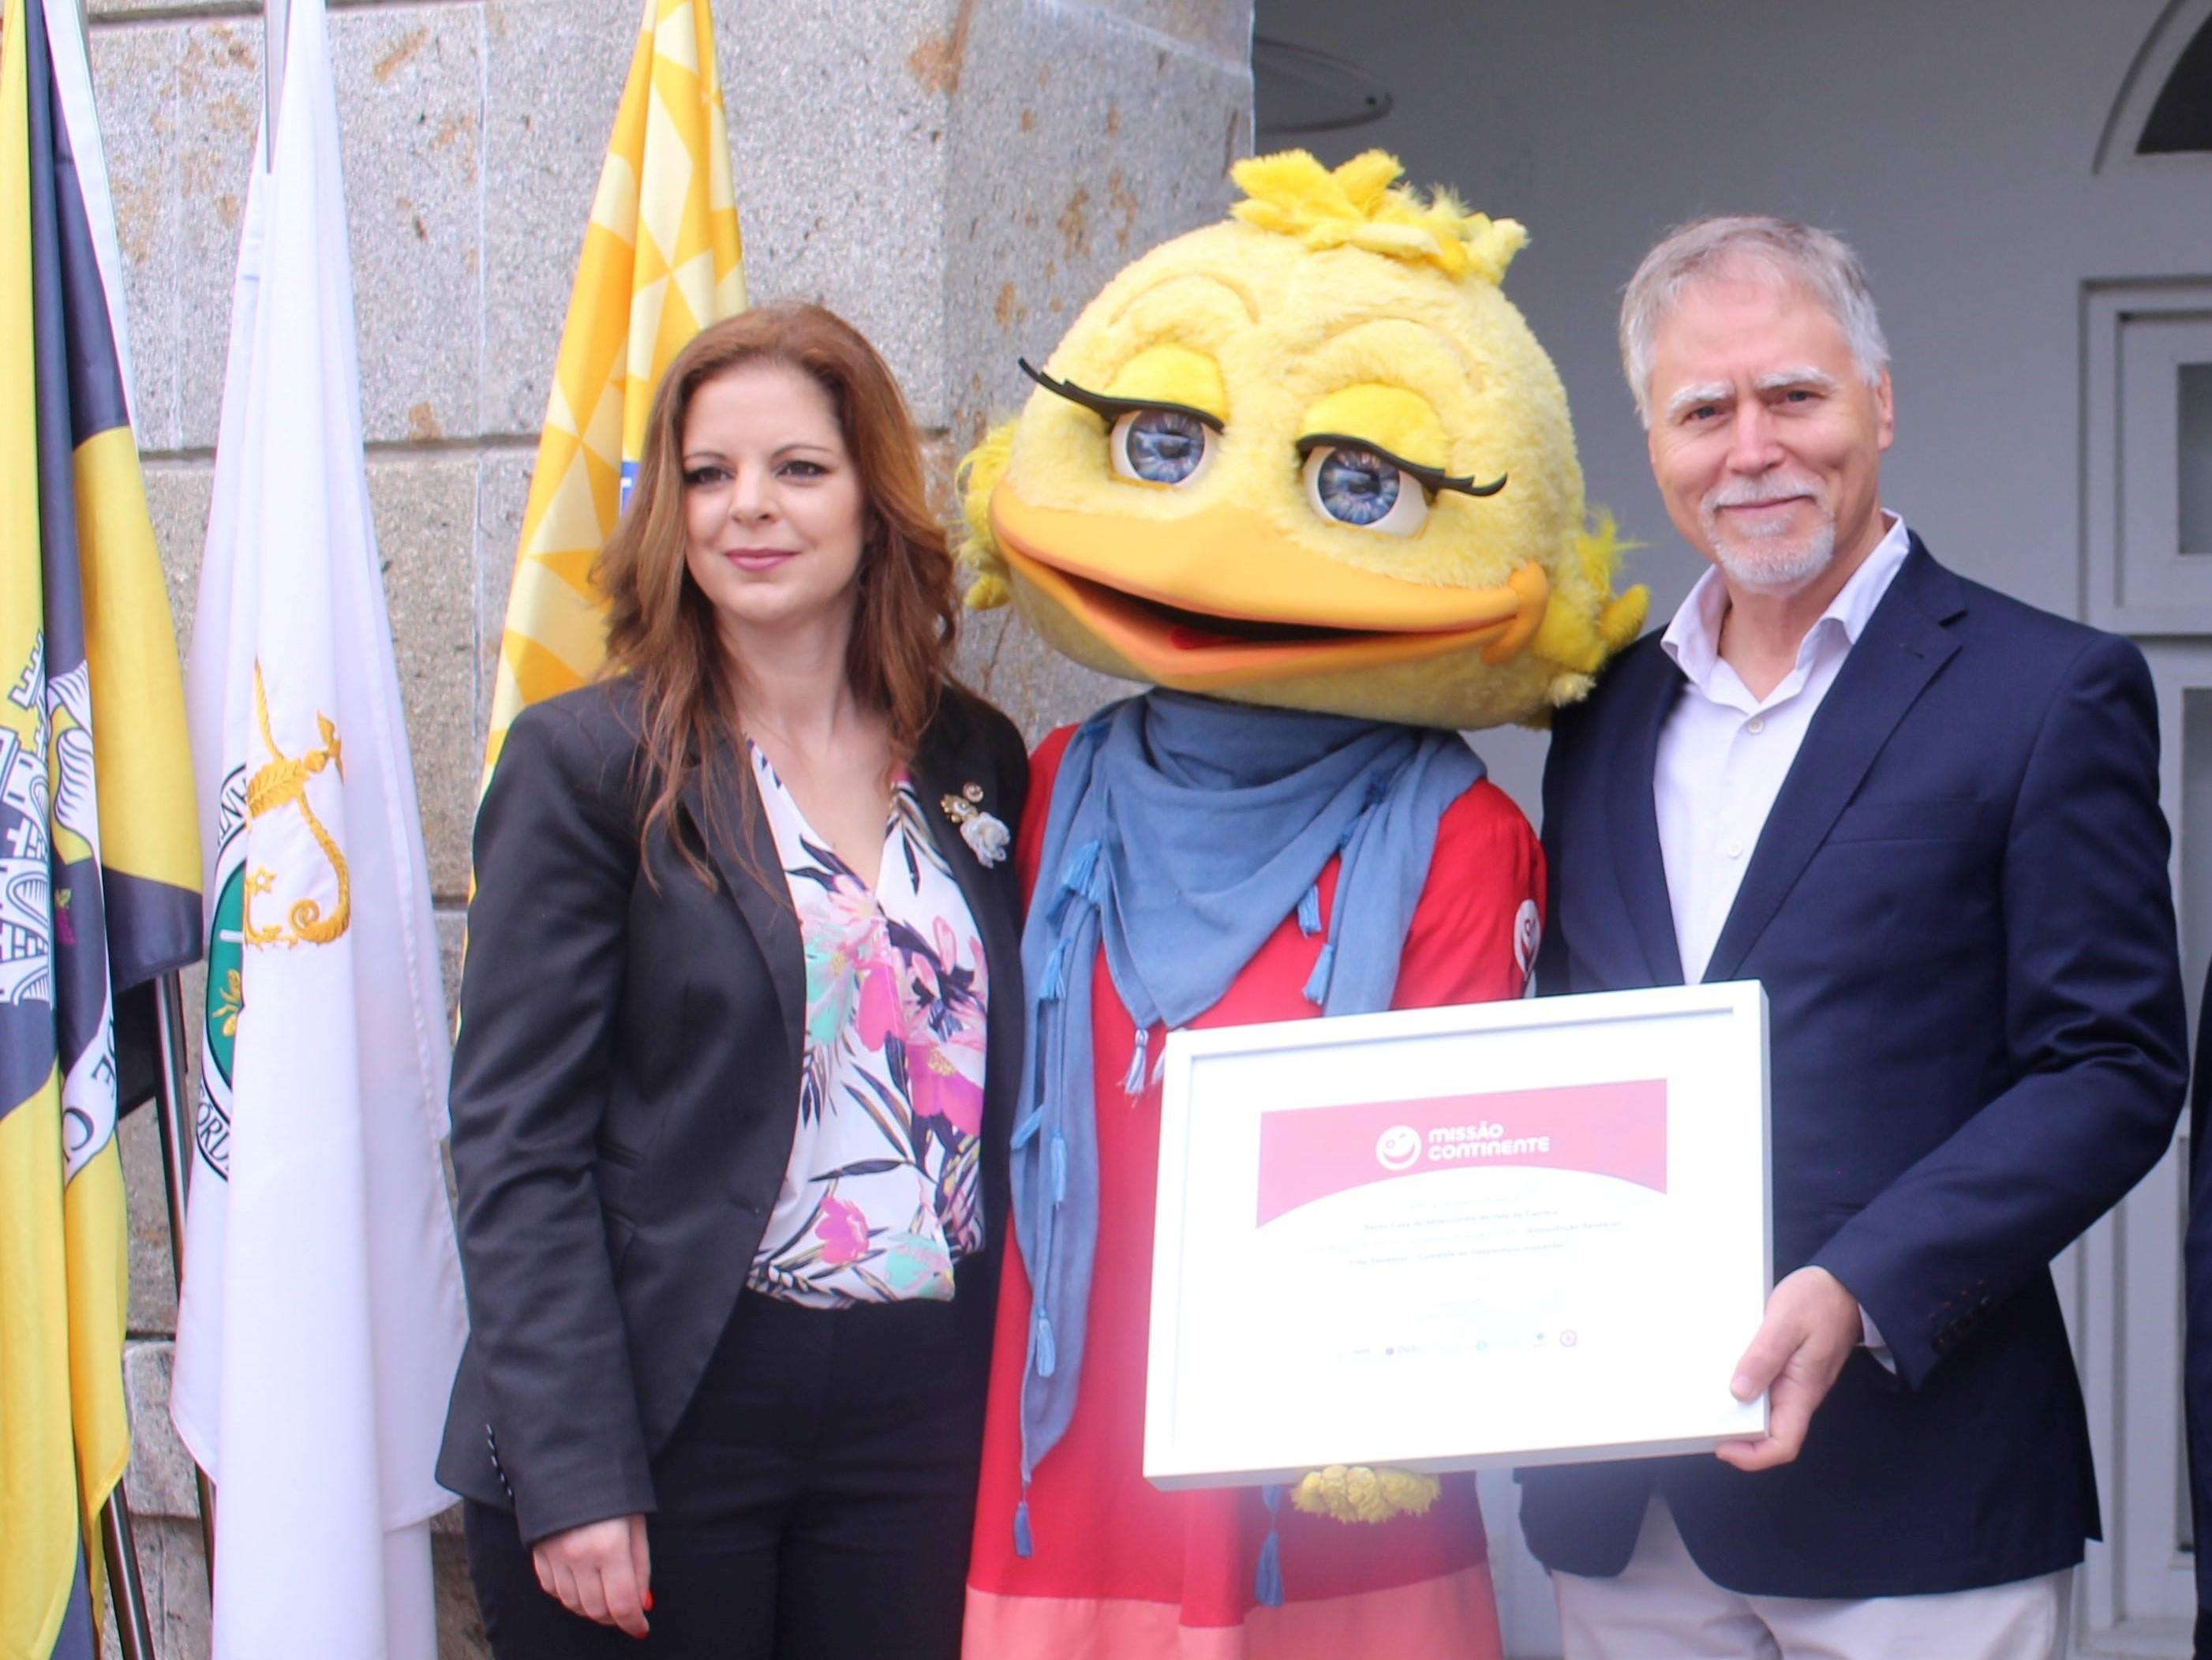 Misericórdia de Vale de Cambra recebeu prémio 'Missão Continente'